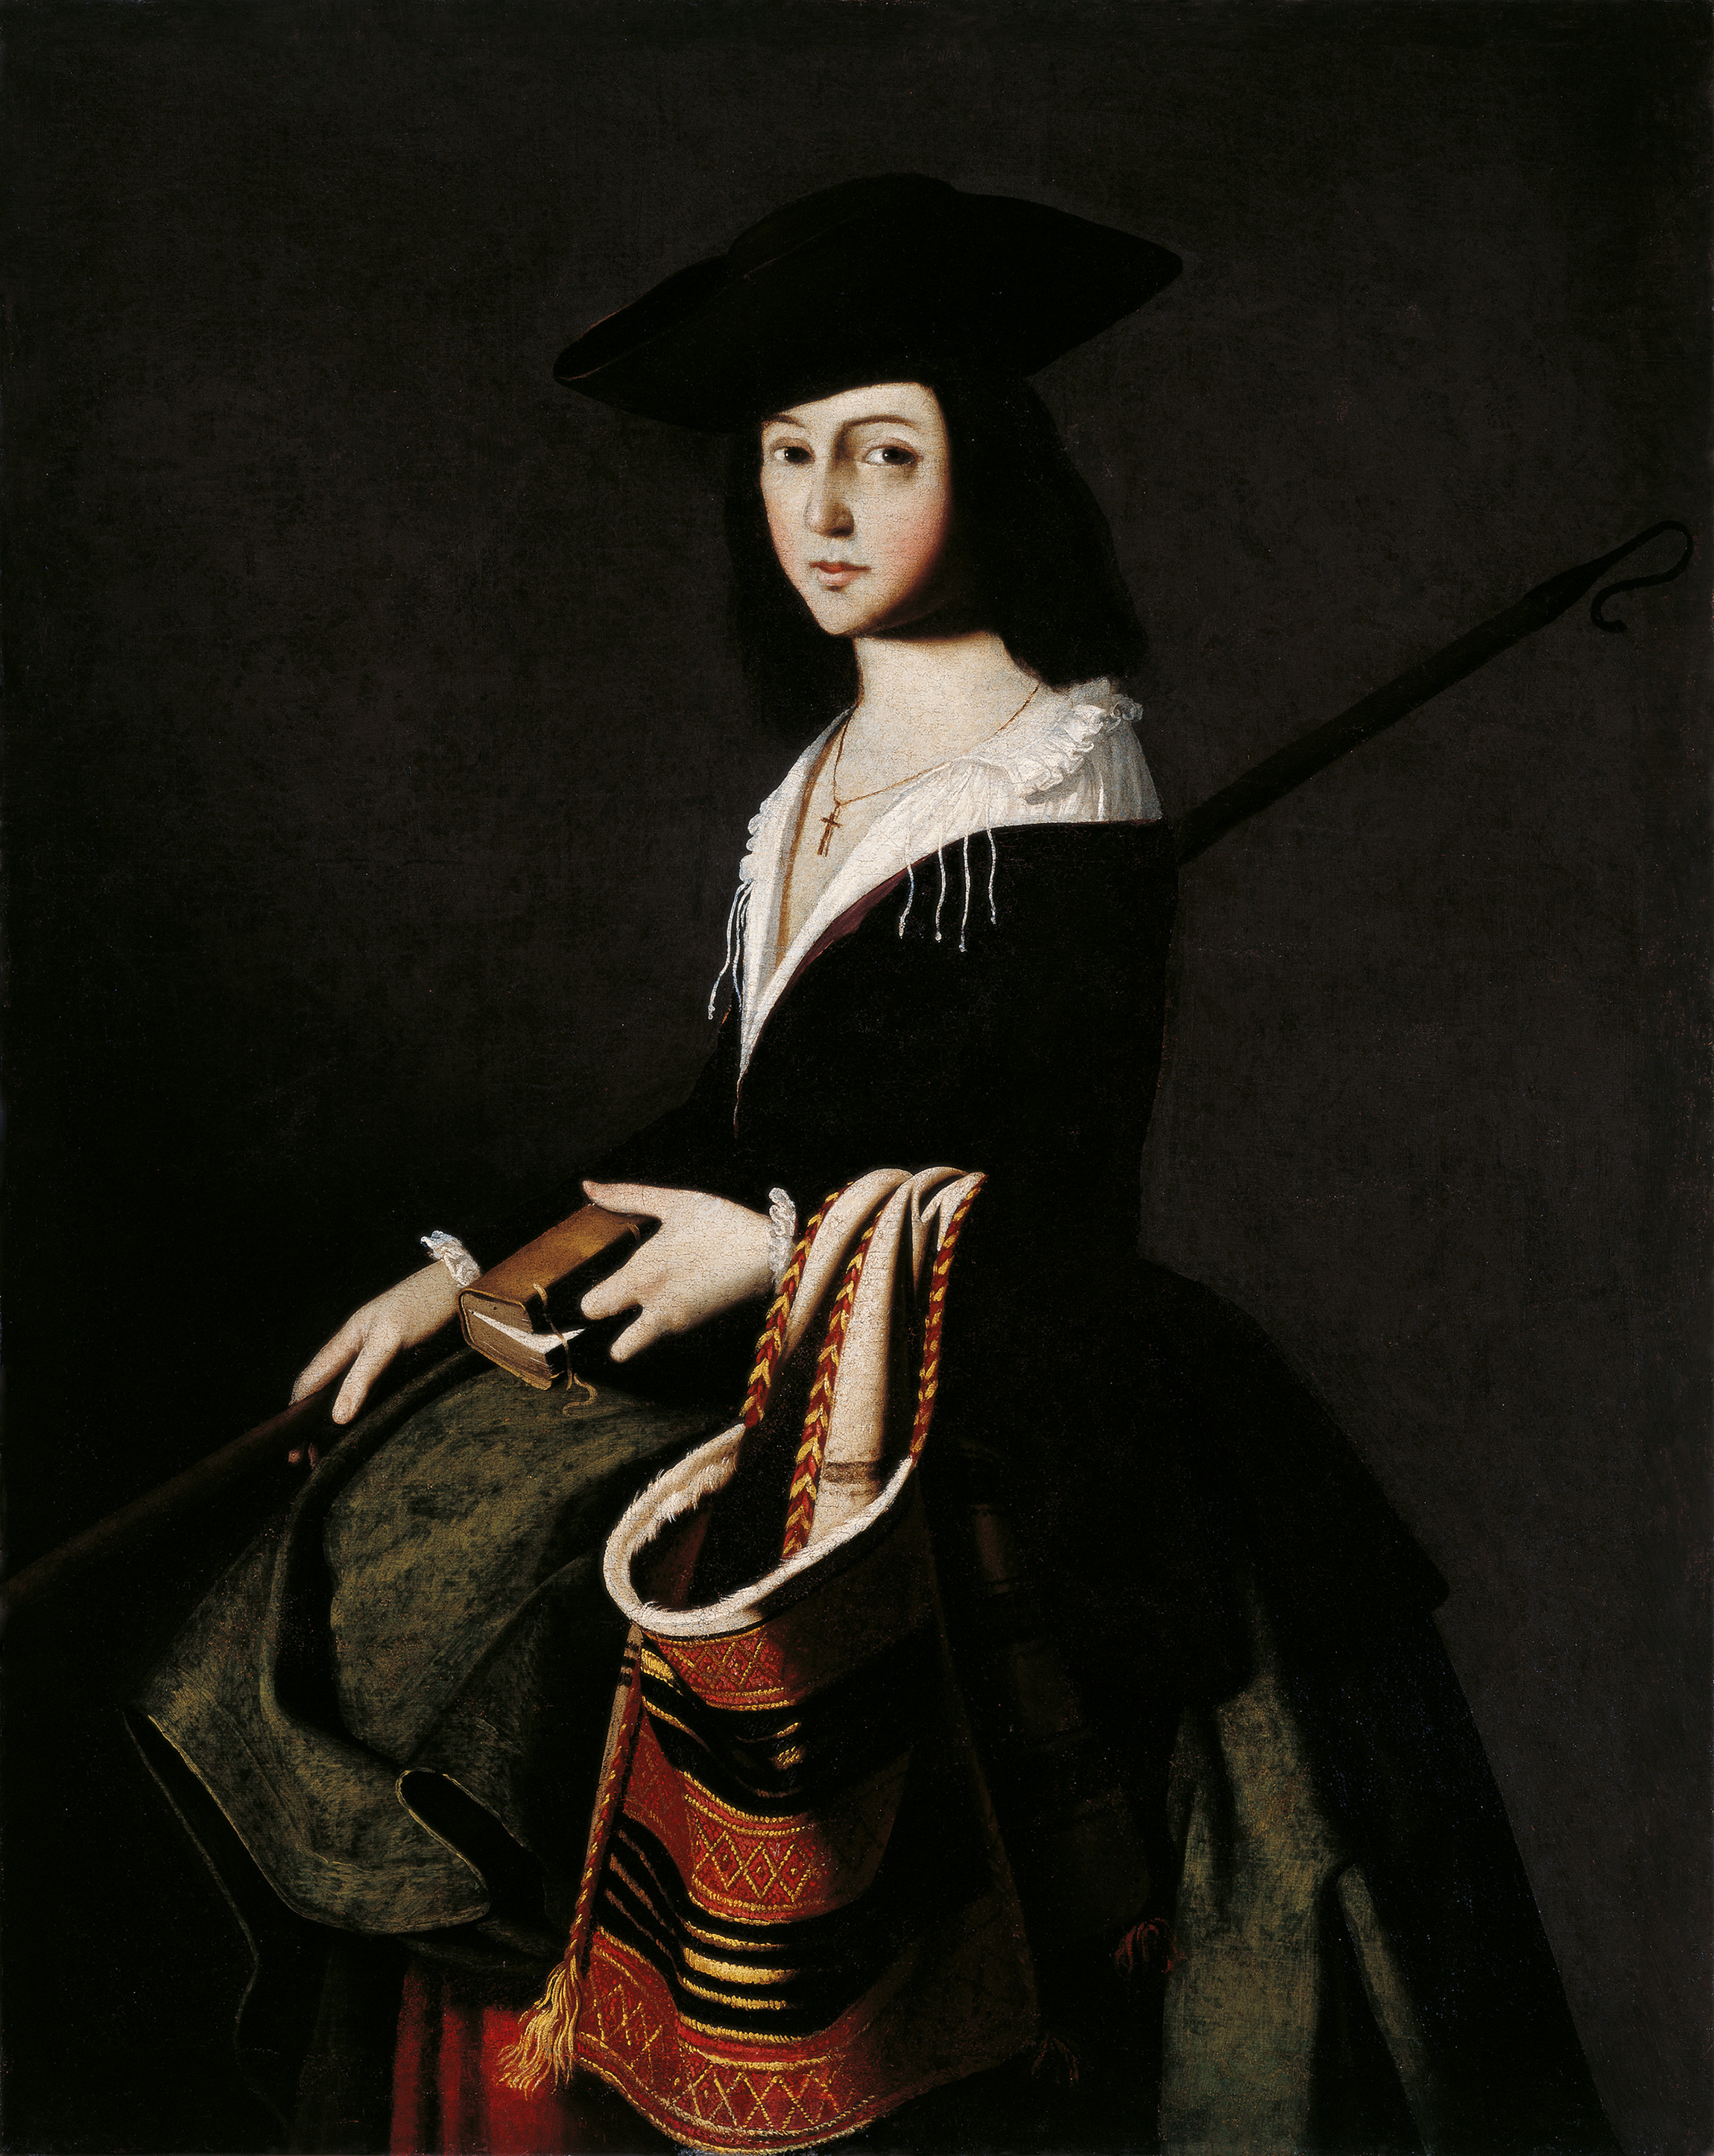 Francisco de Zurbarán - Santa Marina (Saint Marina) c. 1640-1650. Oil on canvas 111 x 88 cm (Colección Carmen Thyssen-Bornemisza)